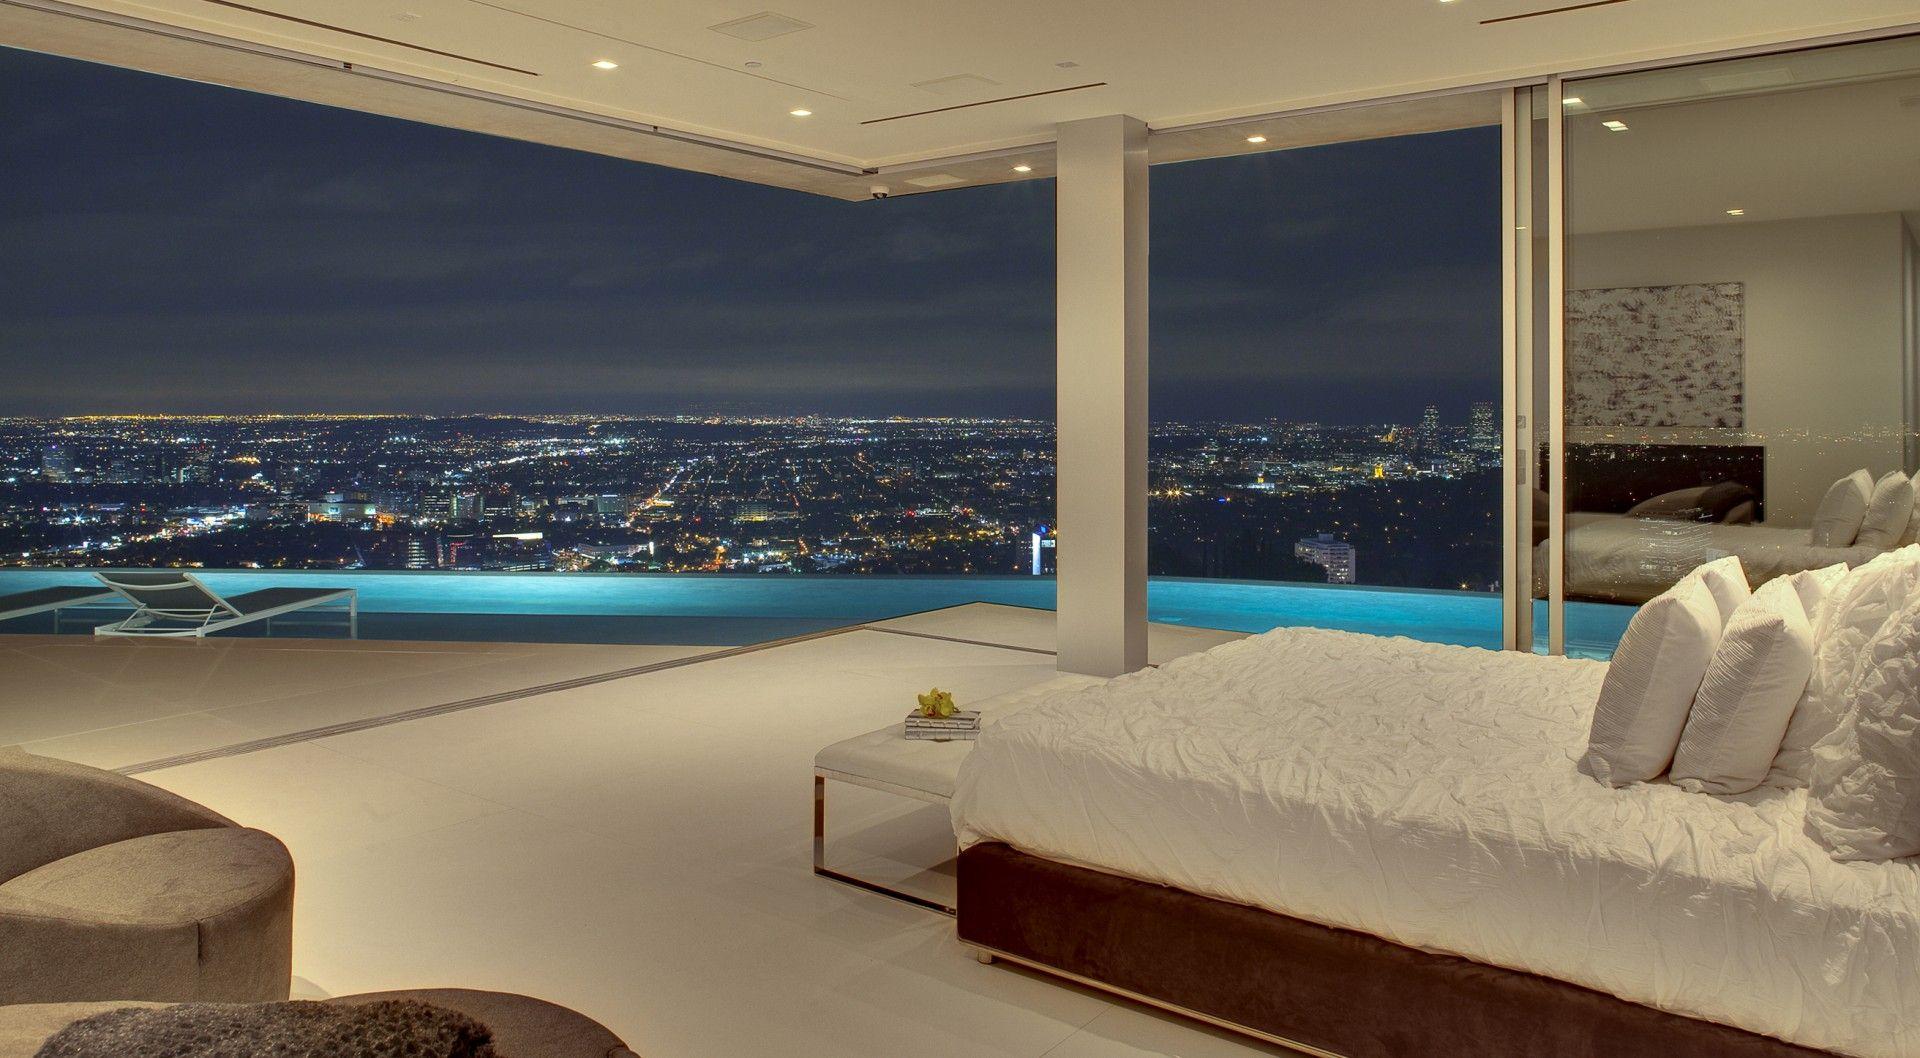 Gulfstream g650 interior bedroom los angeles architect house design  mcclean design  design vip